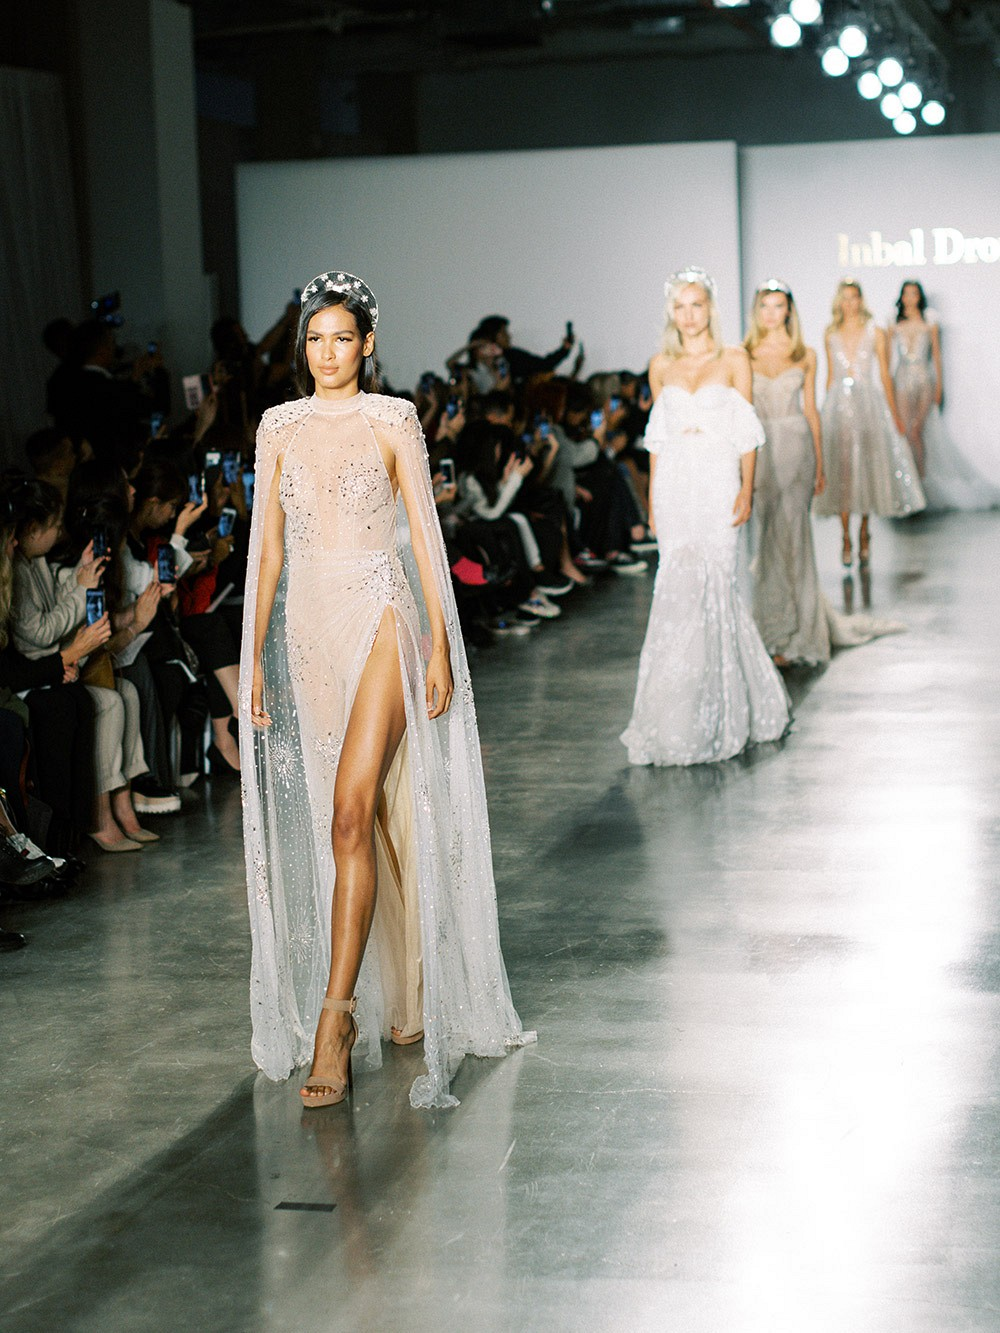 BRIDAL FASHION WEEK 2020 - Claire Pettibone, Costarellos AND Inbal Dror